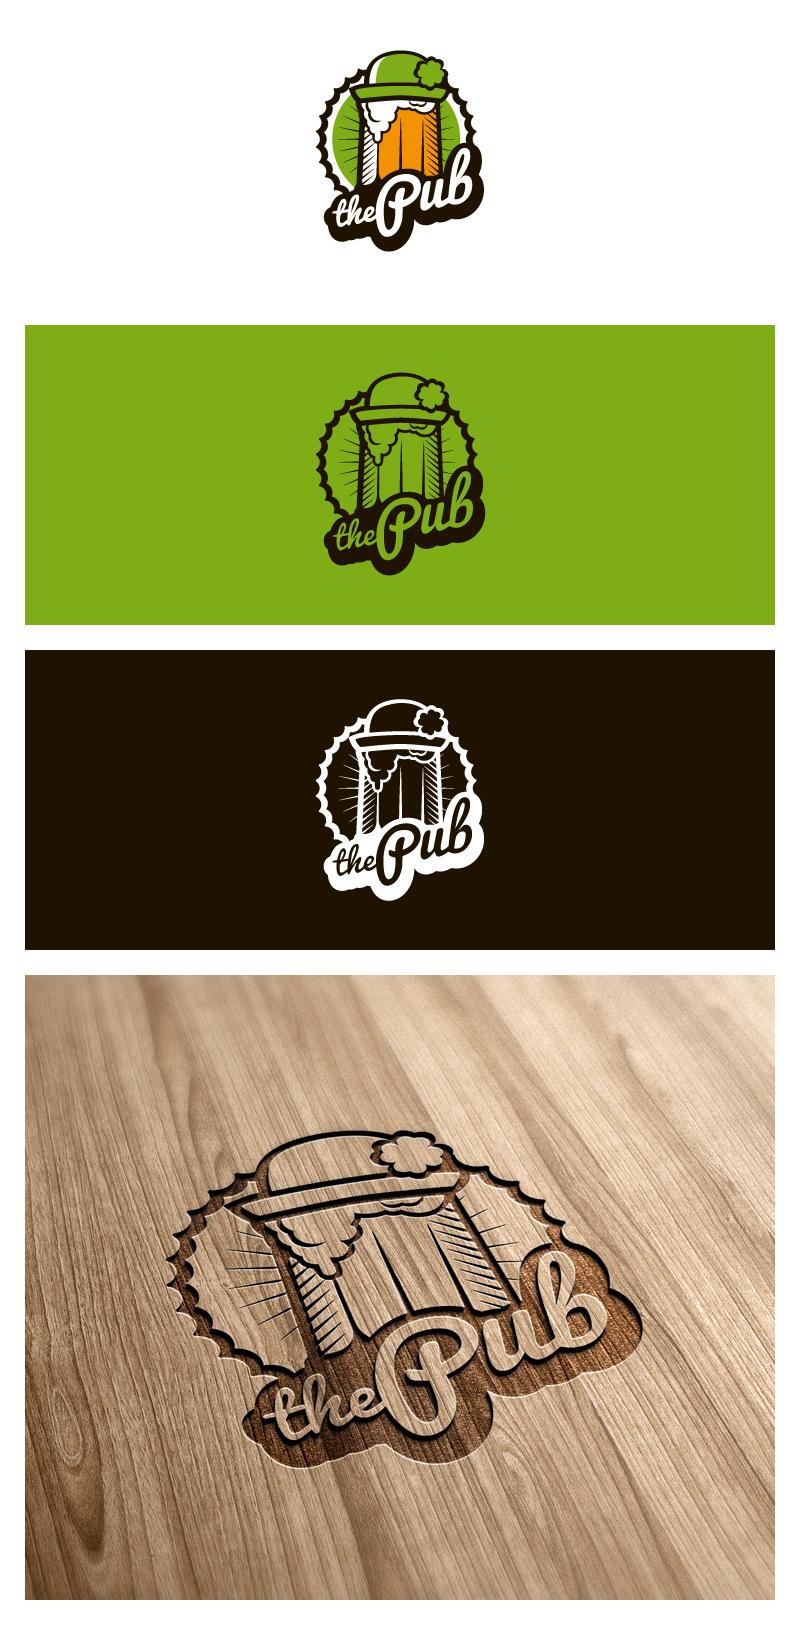 "Разработка логотипа торговой марки ""THEPUB"" фото f_53251e301f67c2c4.jpg"